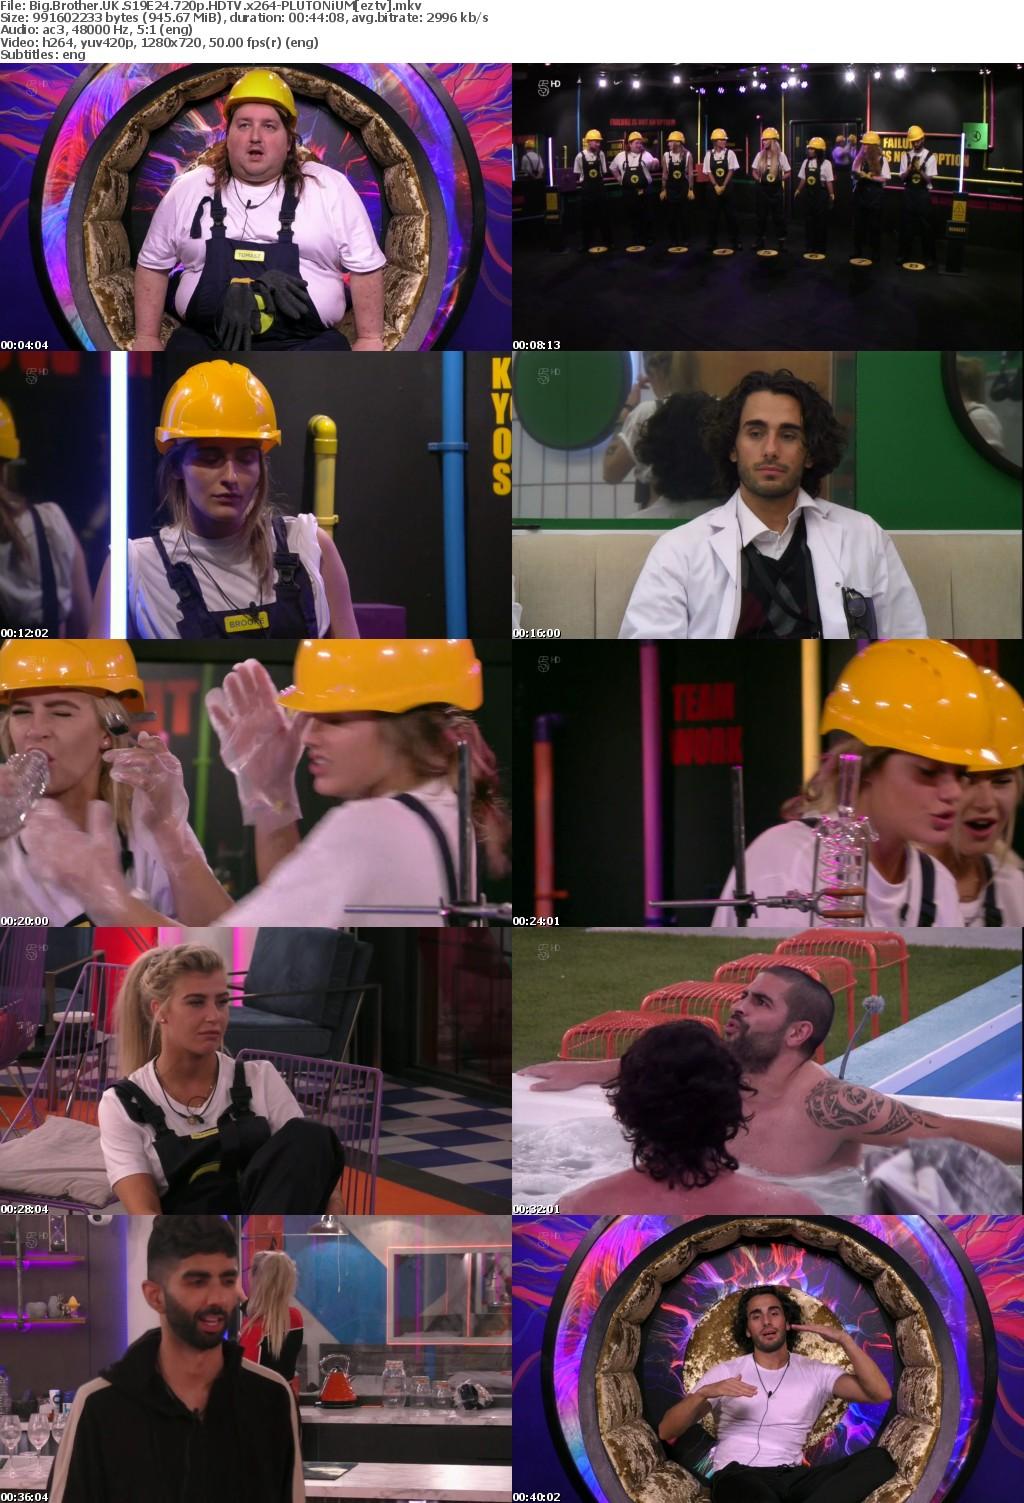 Big Brother UK S19E24 720p HDTV x264-PLUTONiUM